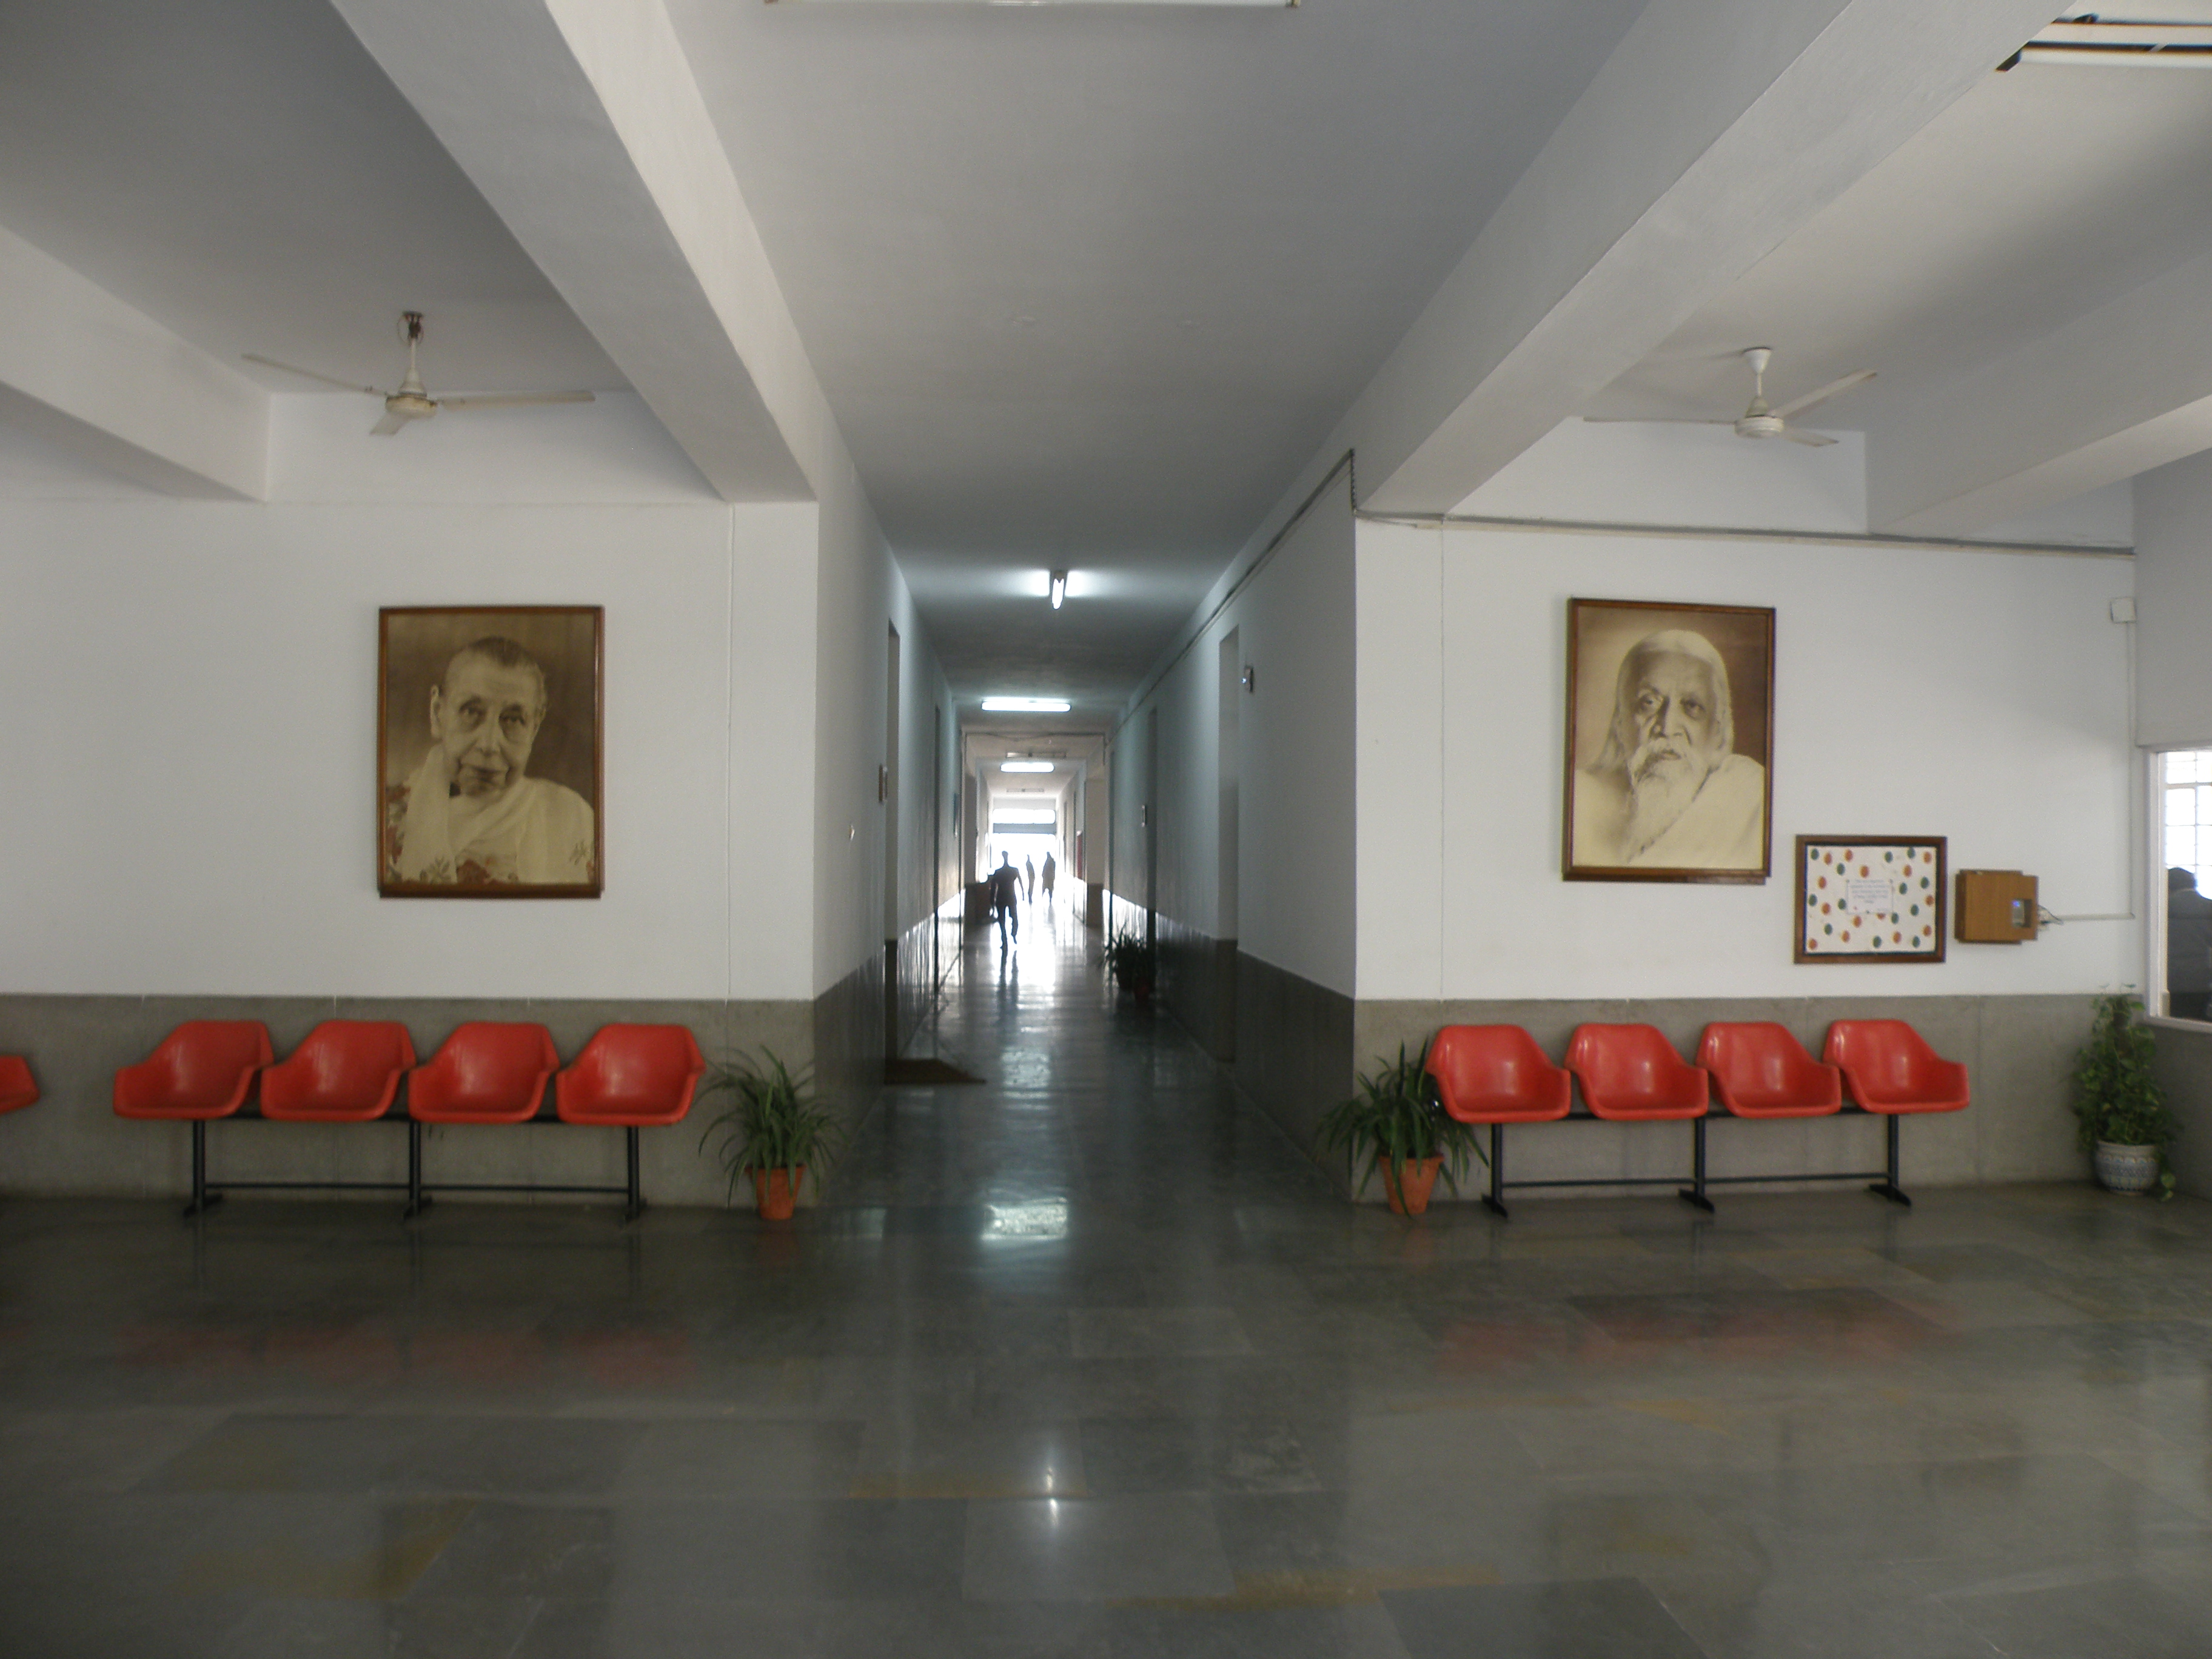 Foyer Office Address : File foyer near principal s office mother international